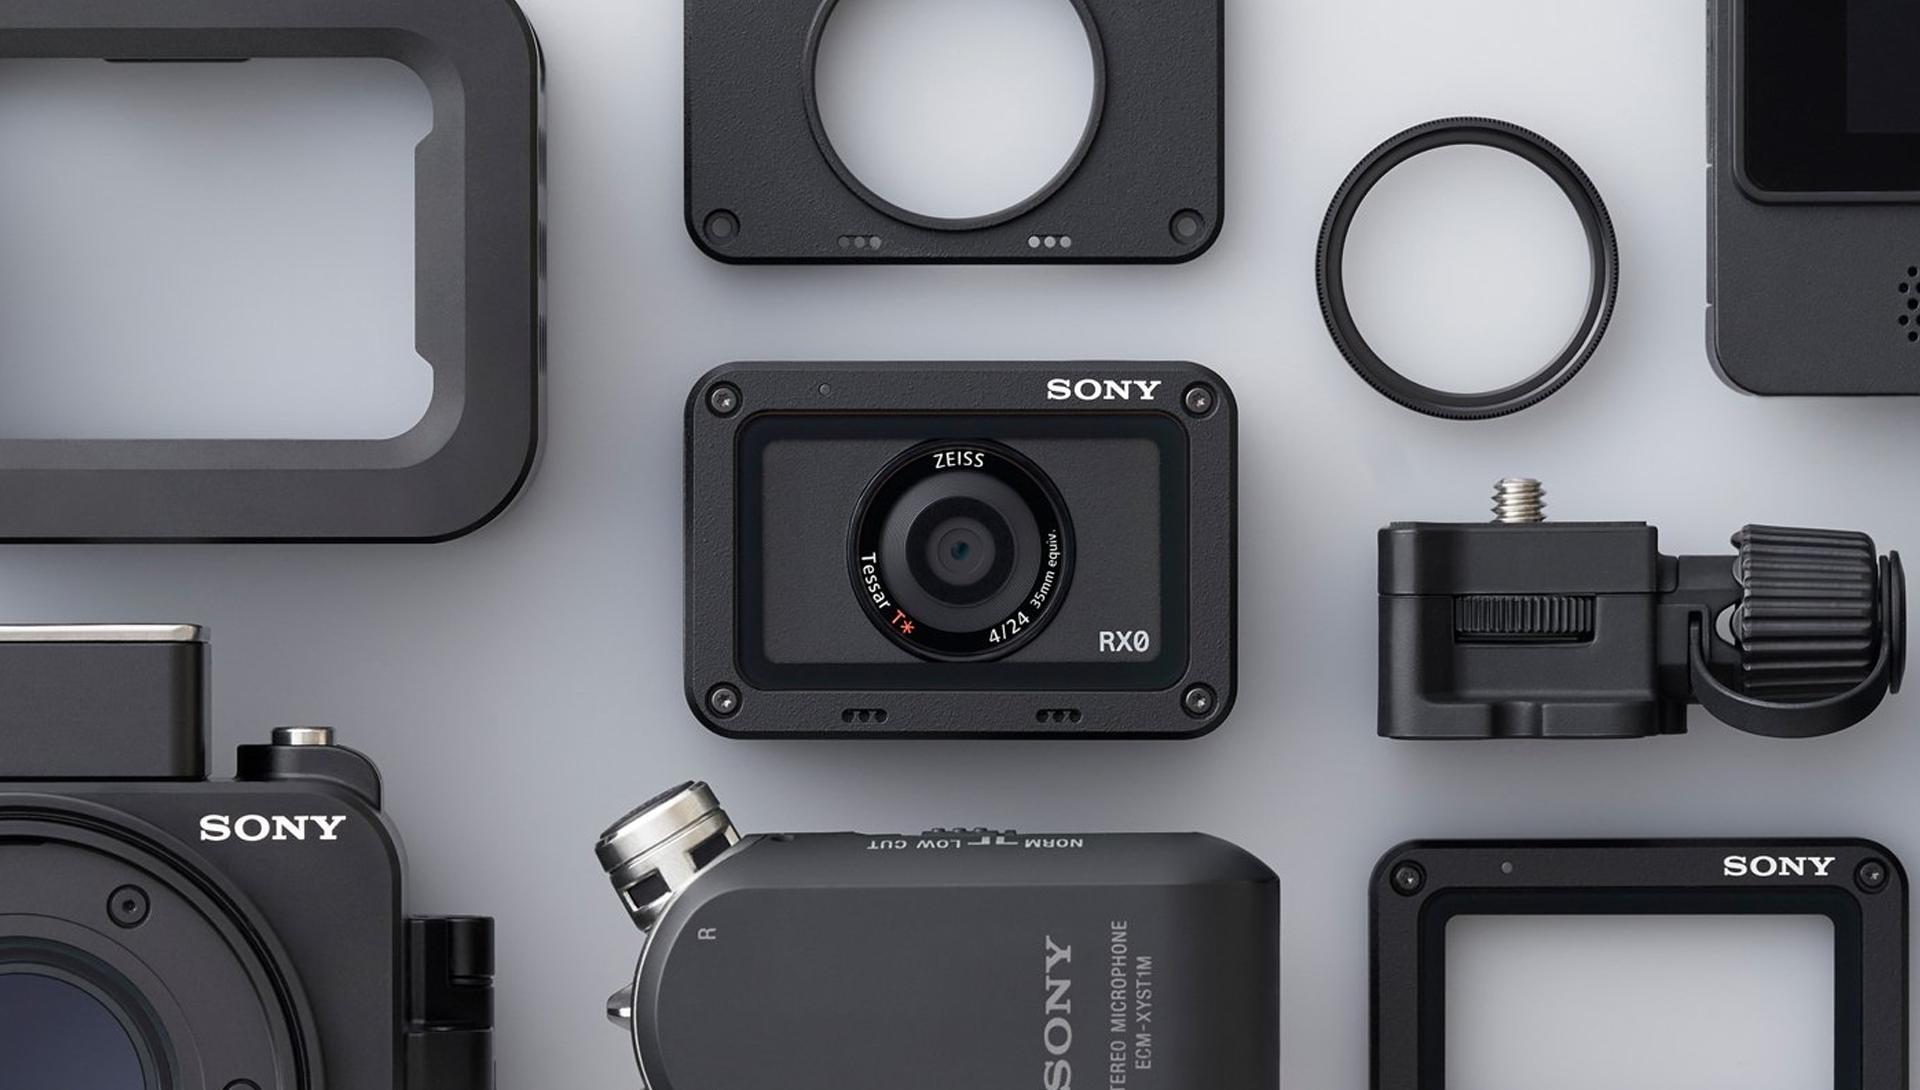 Dettaglio Sony RX0